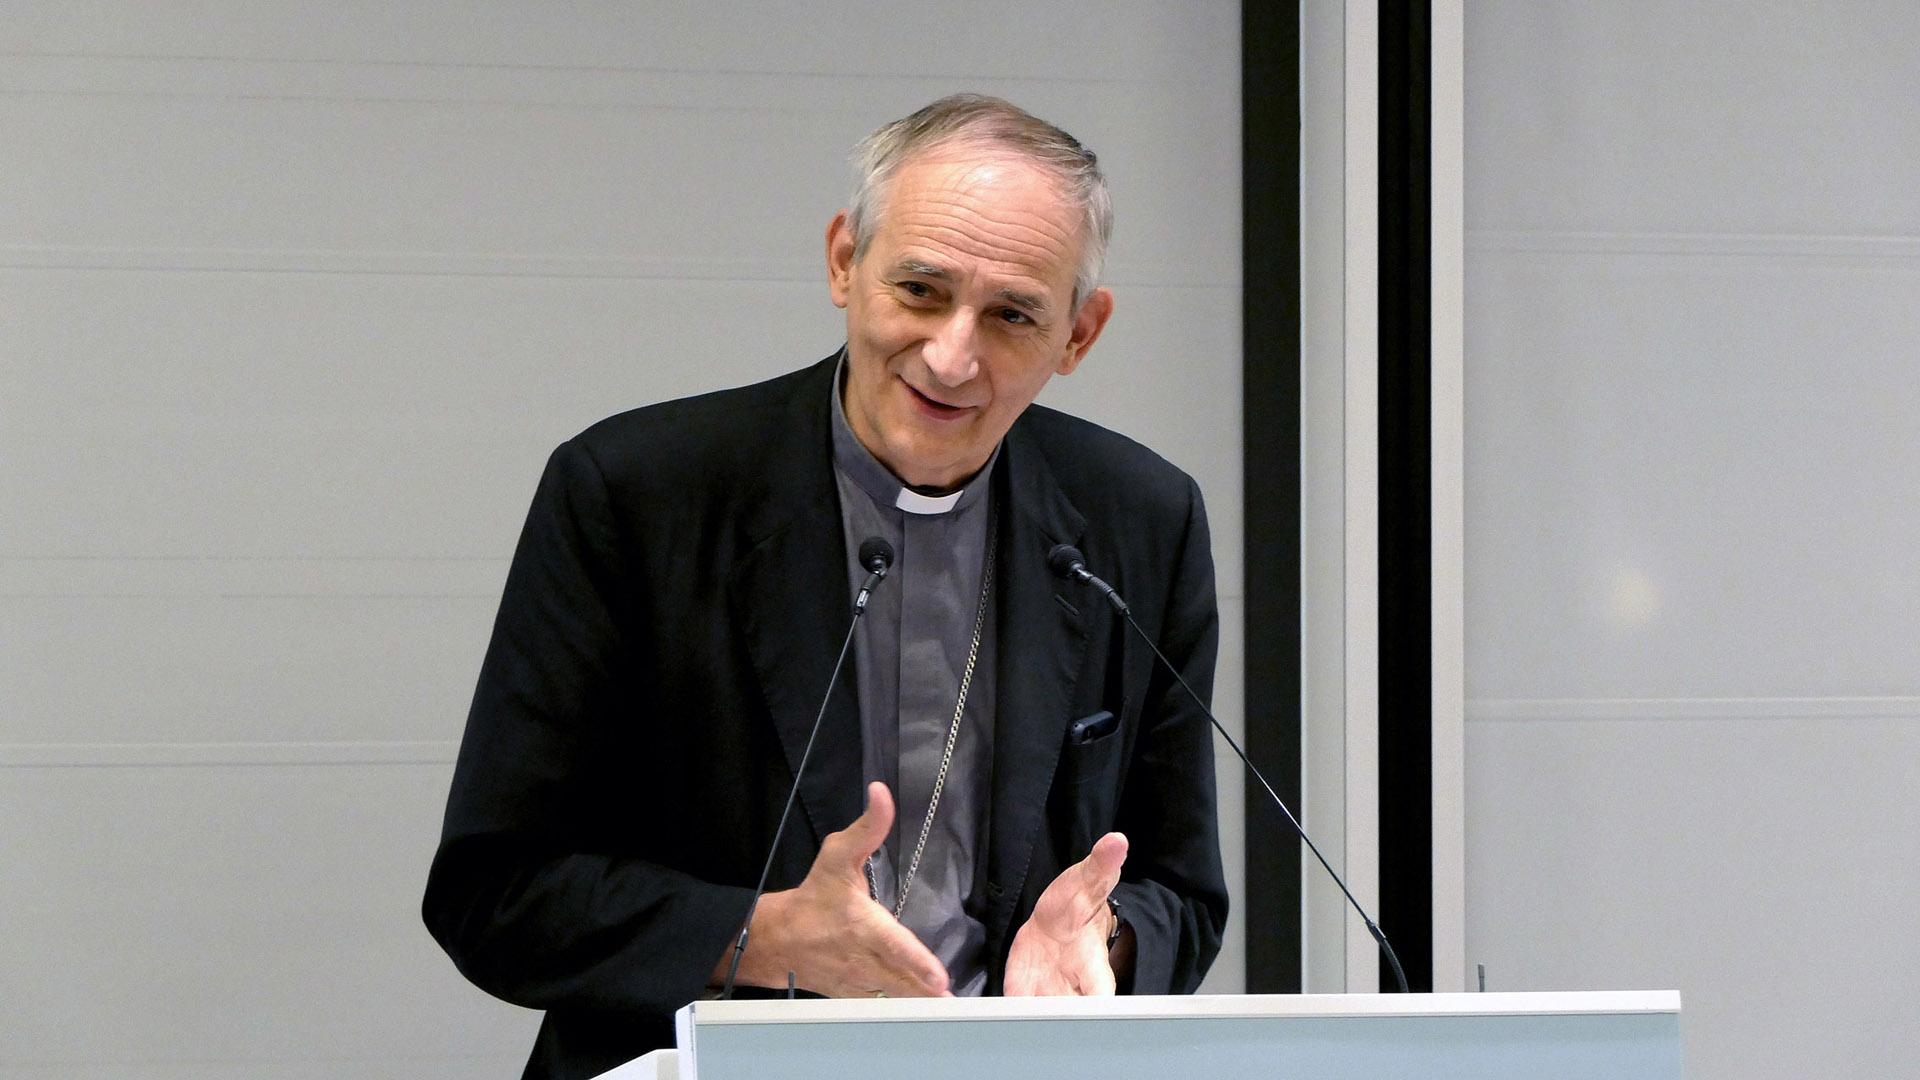 Matteo Maria Zuppi, Arcivescovo Metropolita di Bologna